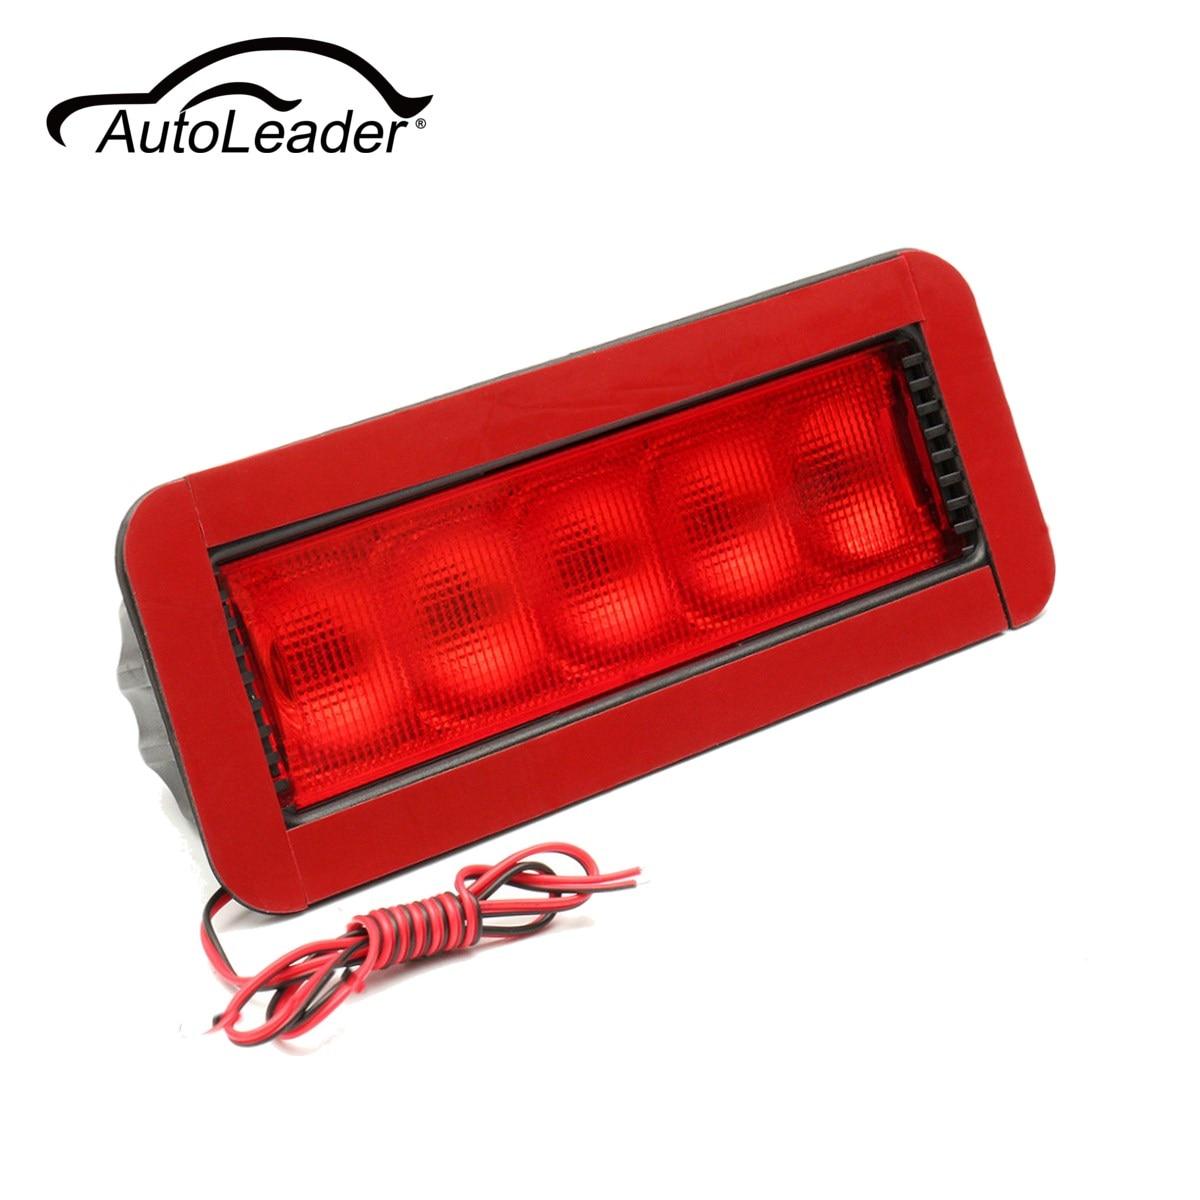 AutoLeader Universal Car Red 5LED 12V Rear High Mount Lever Third 3RD Brake Stop Tail Light Car LED Light 0.5W Plastic